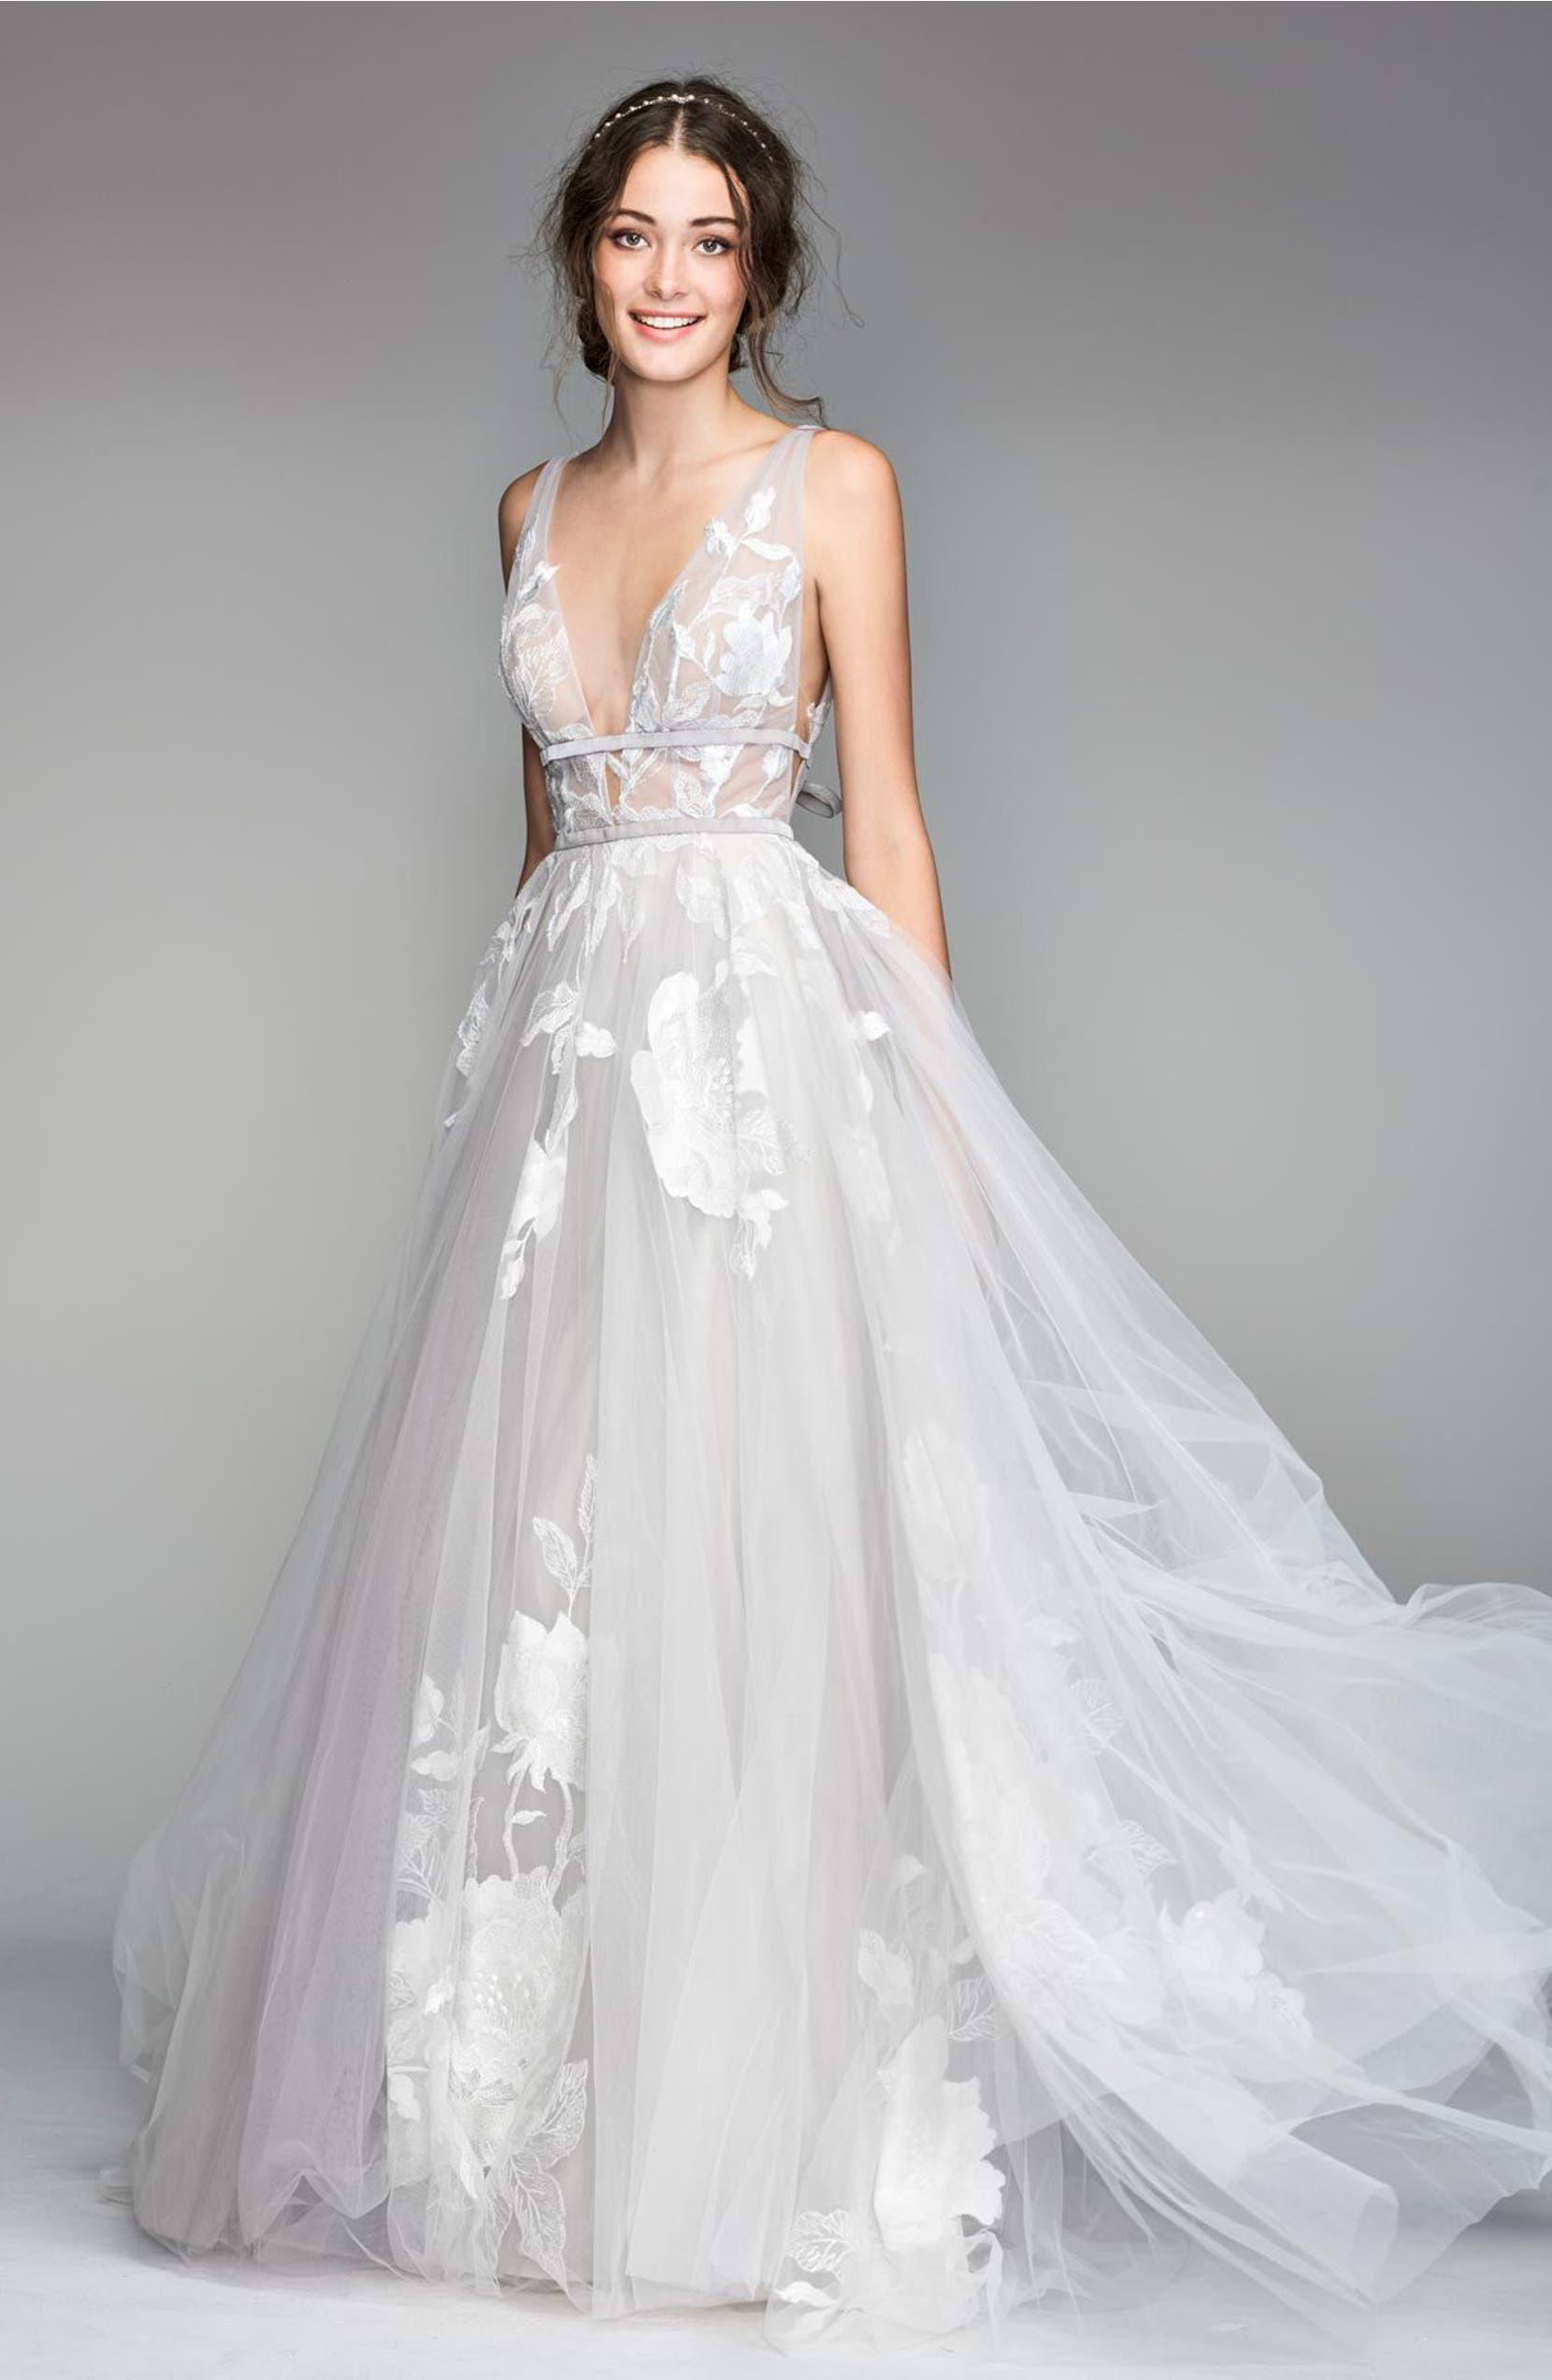 382b0a54f66da Galatea Embroidered V-Neck Tulle Wedding Dress